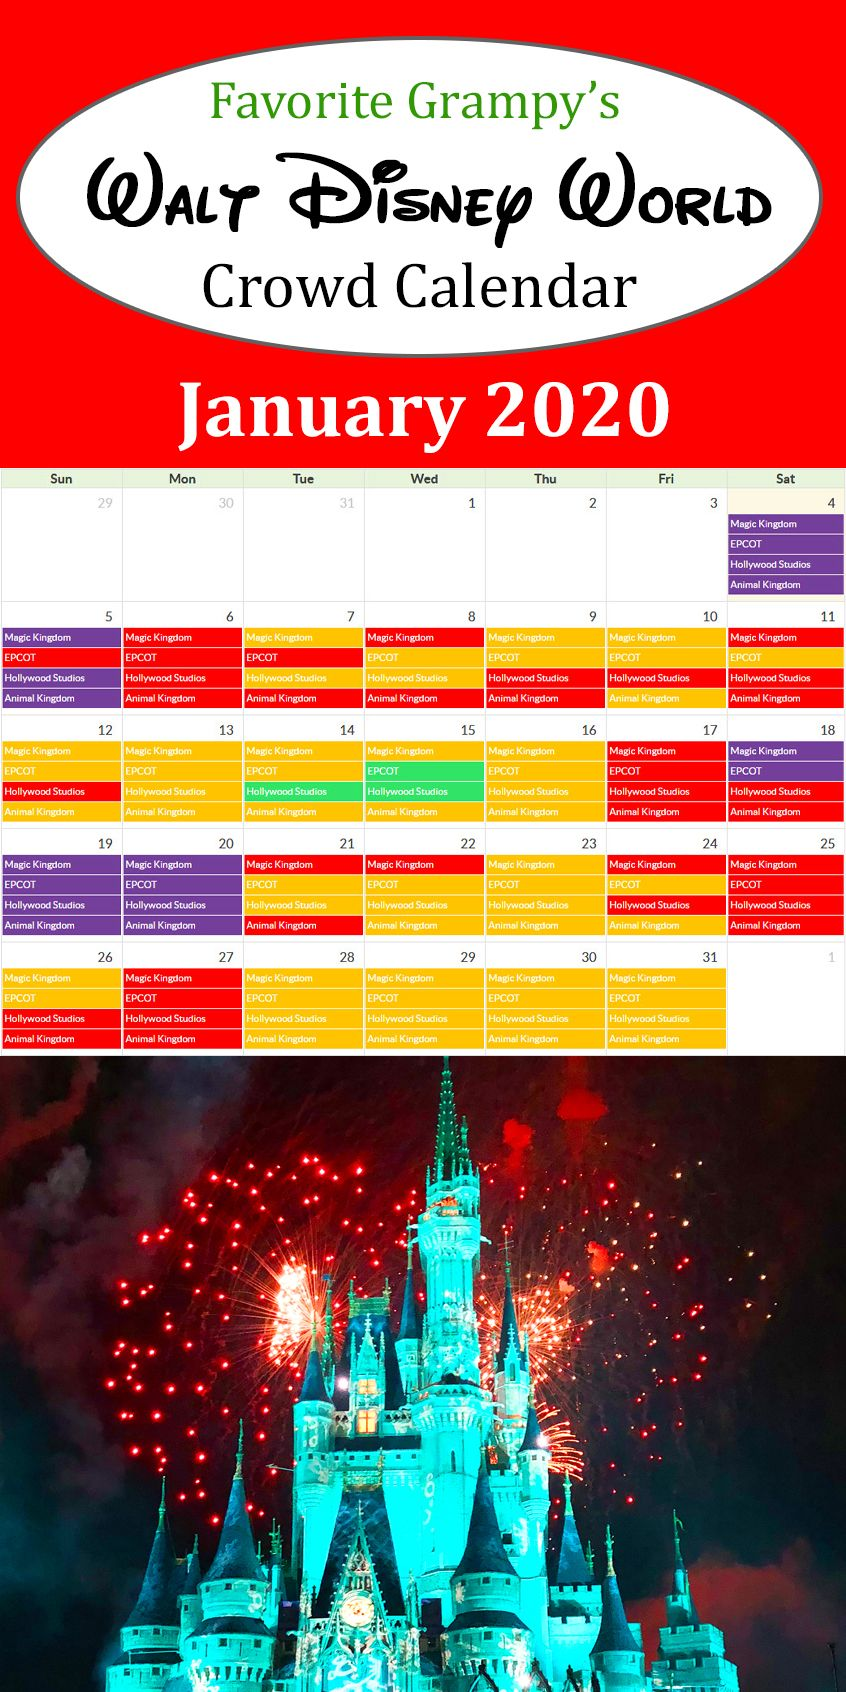 Disney World Crowd Calendar By In 2020 Disney World Crowd